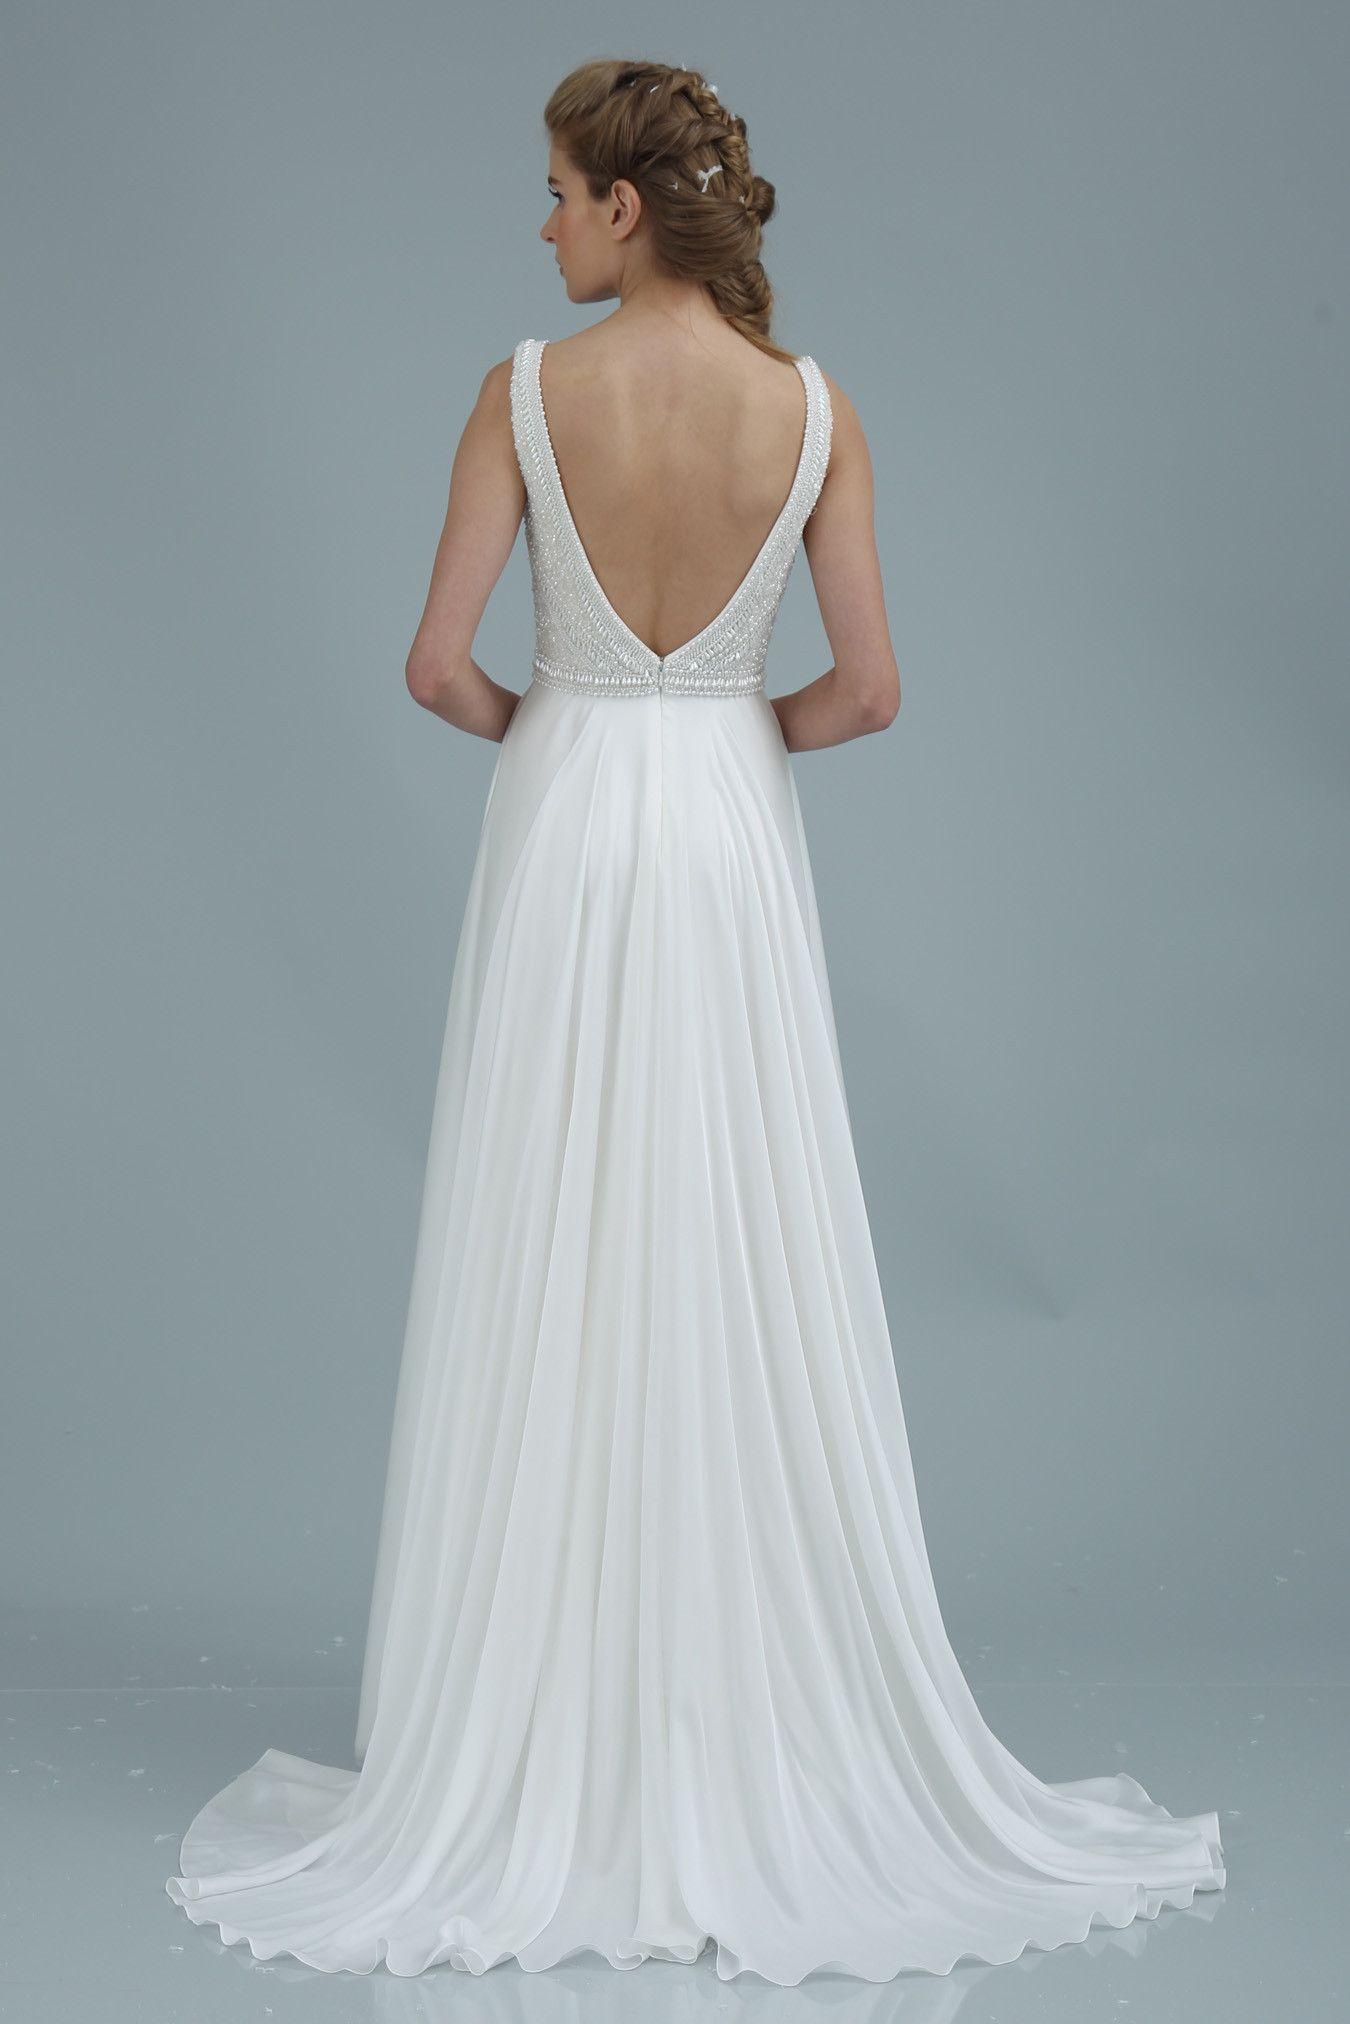 Nava – THEIA   Wedding - Dresses   Pinterest   Wedding dress ...